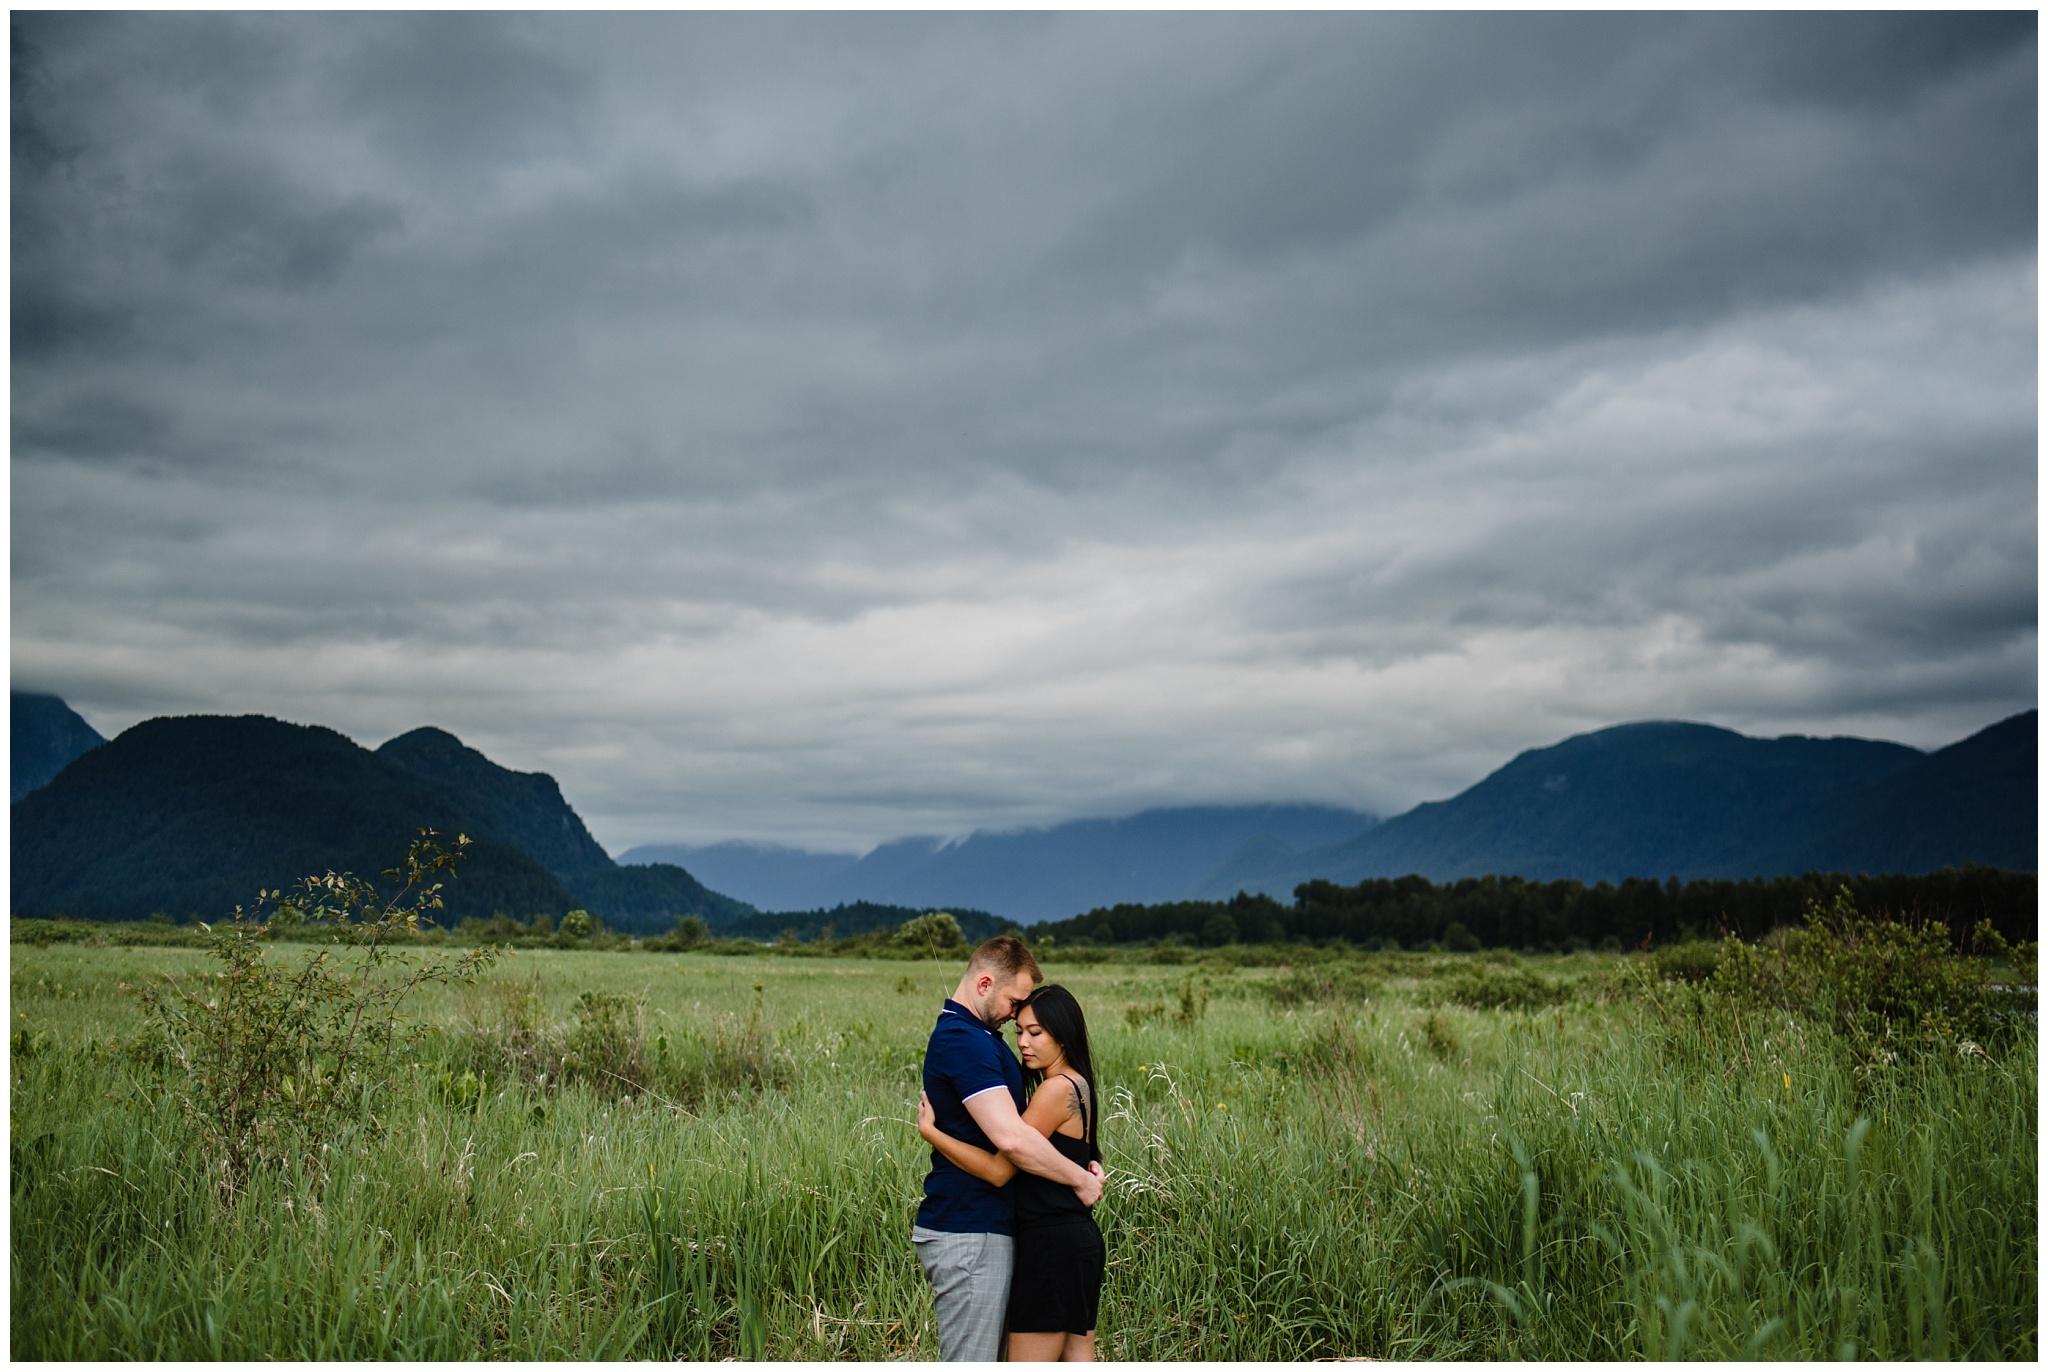 Pitt Lake Engagement Photos Maple Ridge Candid Fun Romantic Couples Photography_0001.jpg